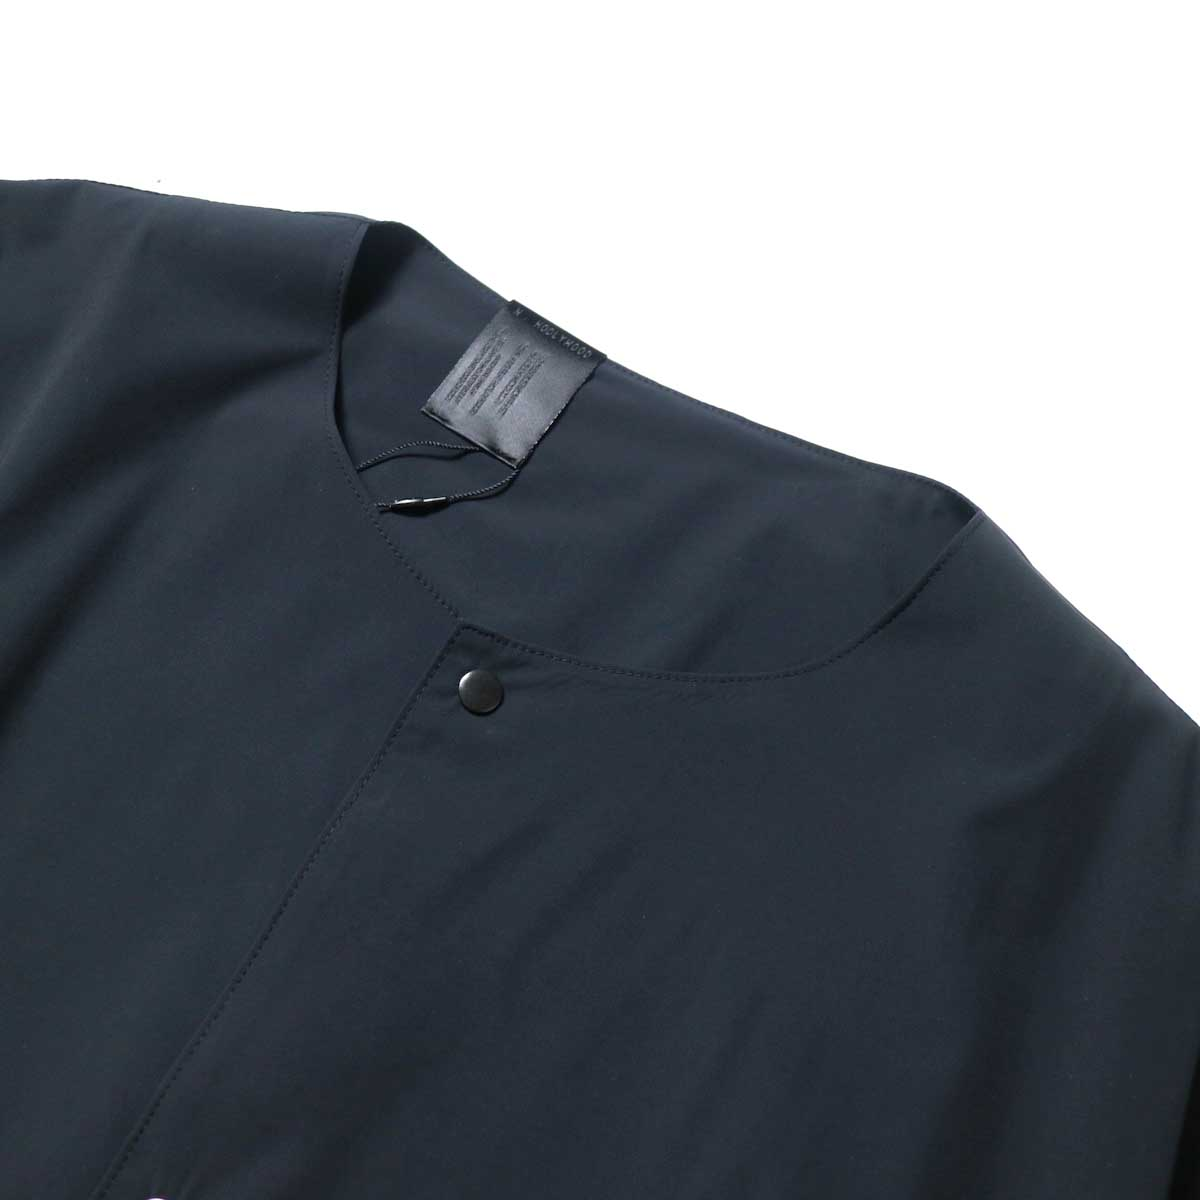 N.HOOLYWOOD / 2211-SH25-006 peg Collarless Shirt (Black)ノーカラー